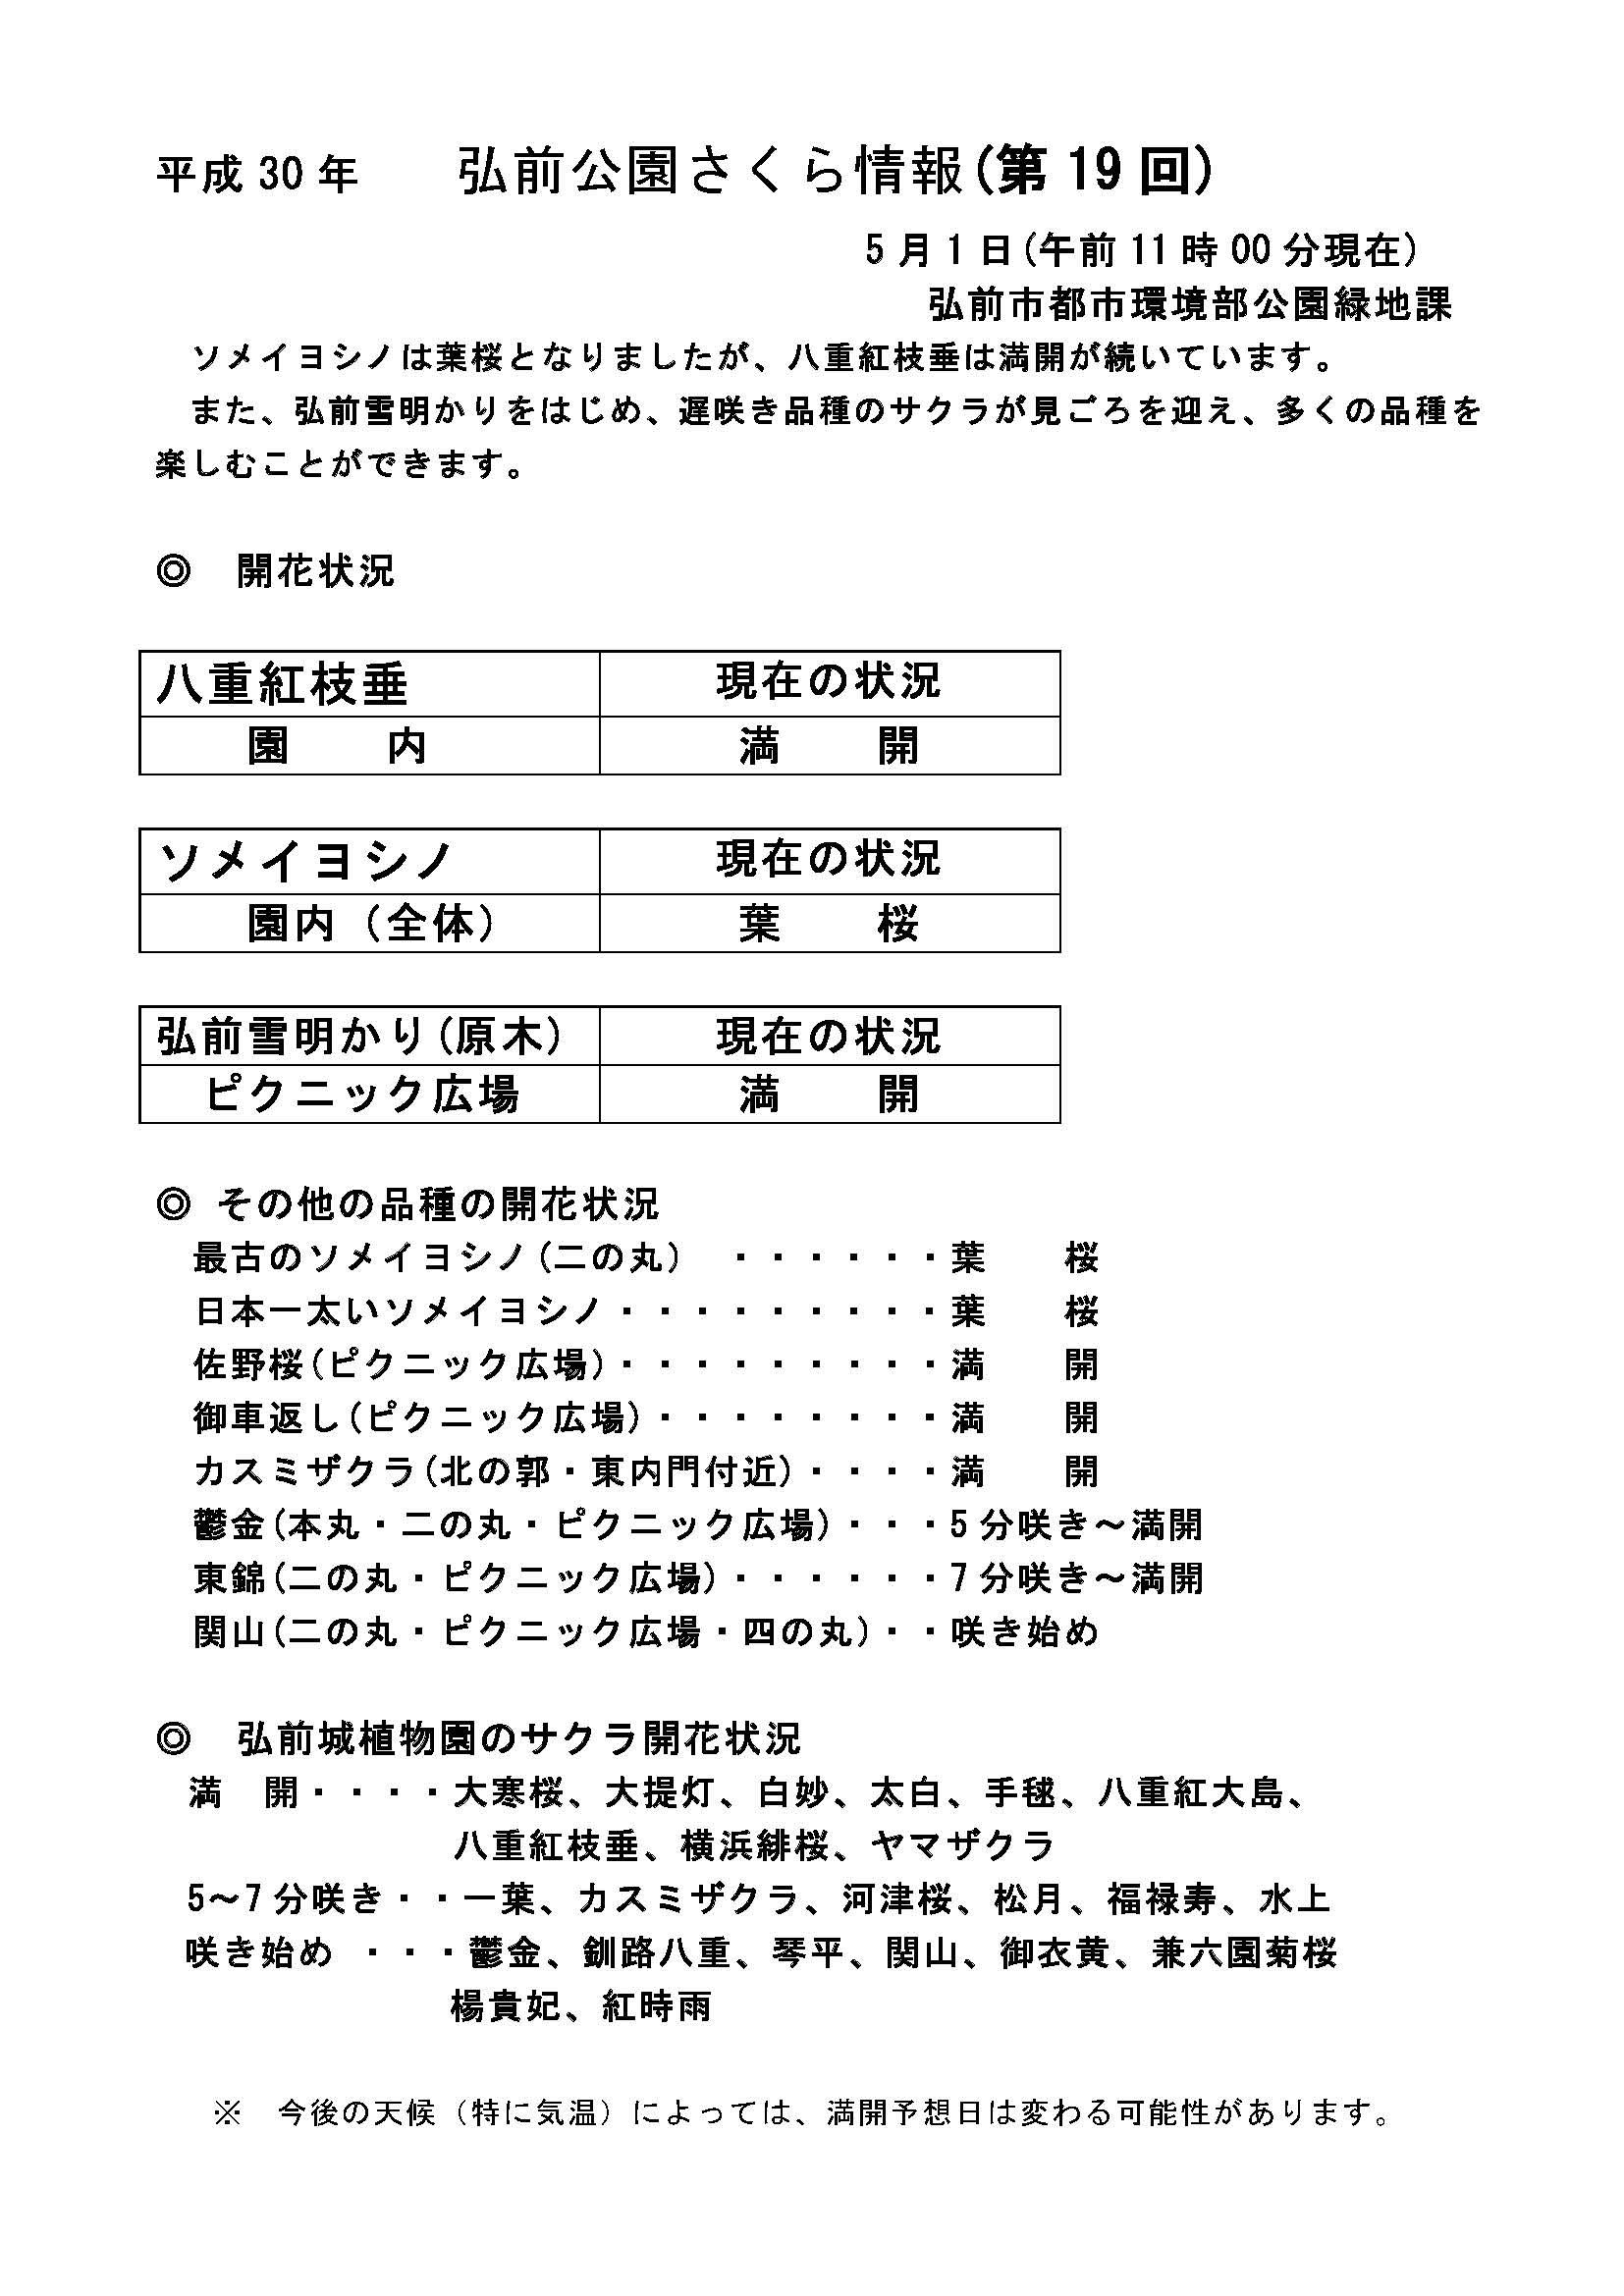 2018年5月1日付 弘前公園さくら情報(第15回)【弘前公園・弘前城】